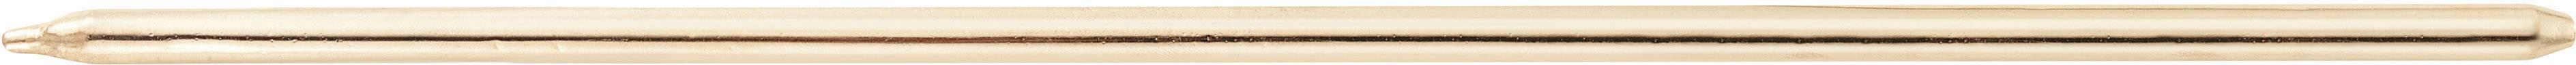 Teplovodná trubka Gelid CP-S8350-01, (Ø x d) 8 mm x 350 mm, měď, voda